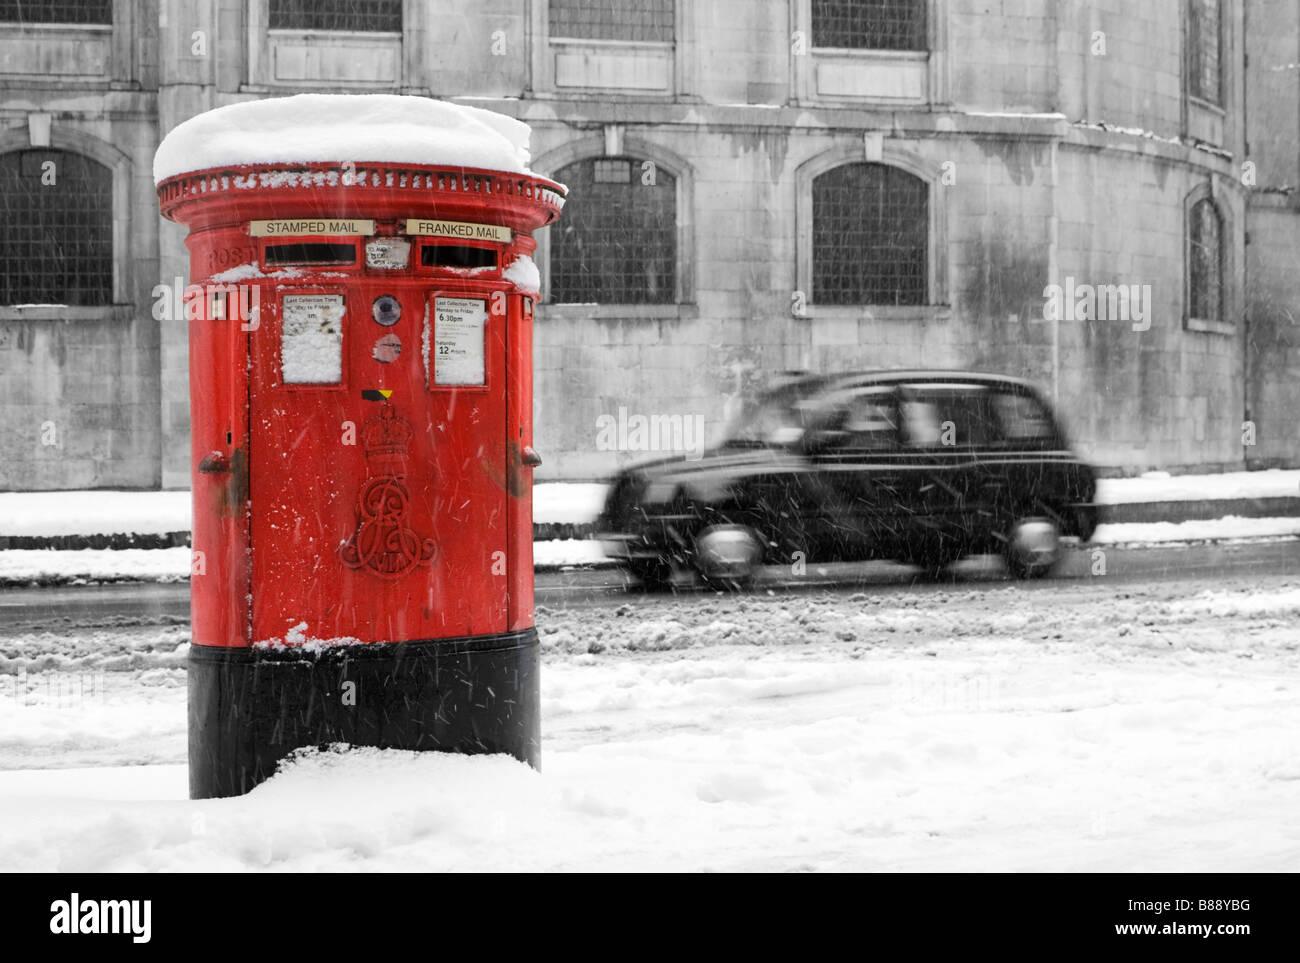 London snow scene - Stock Image